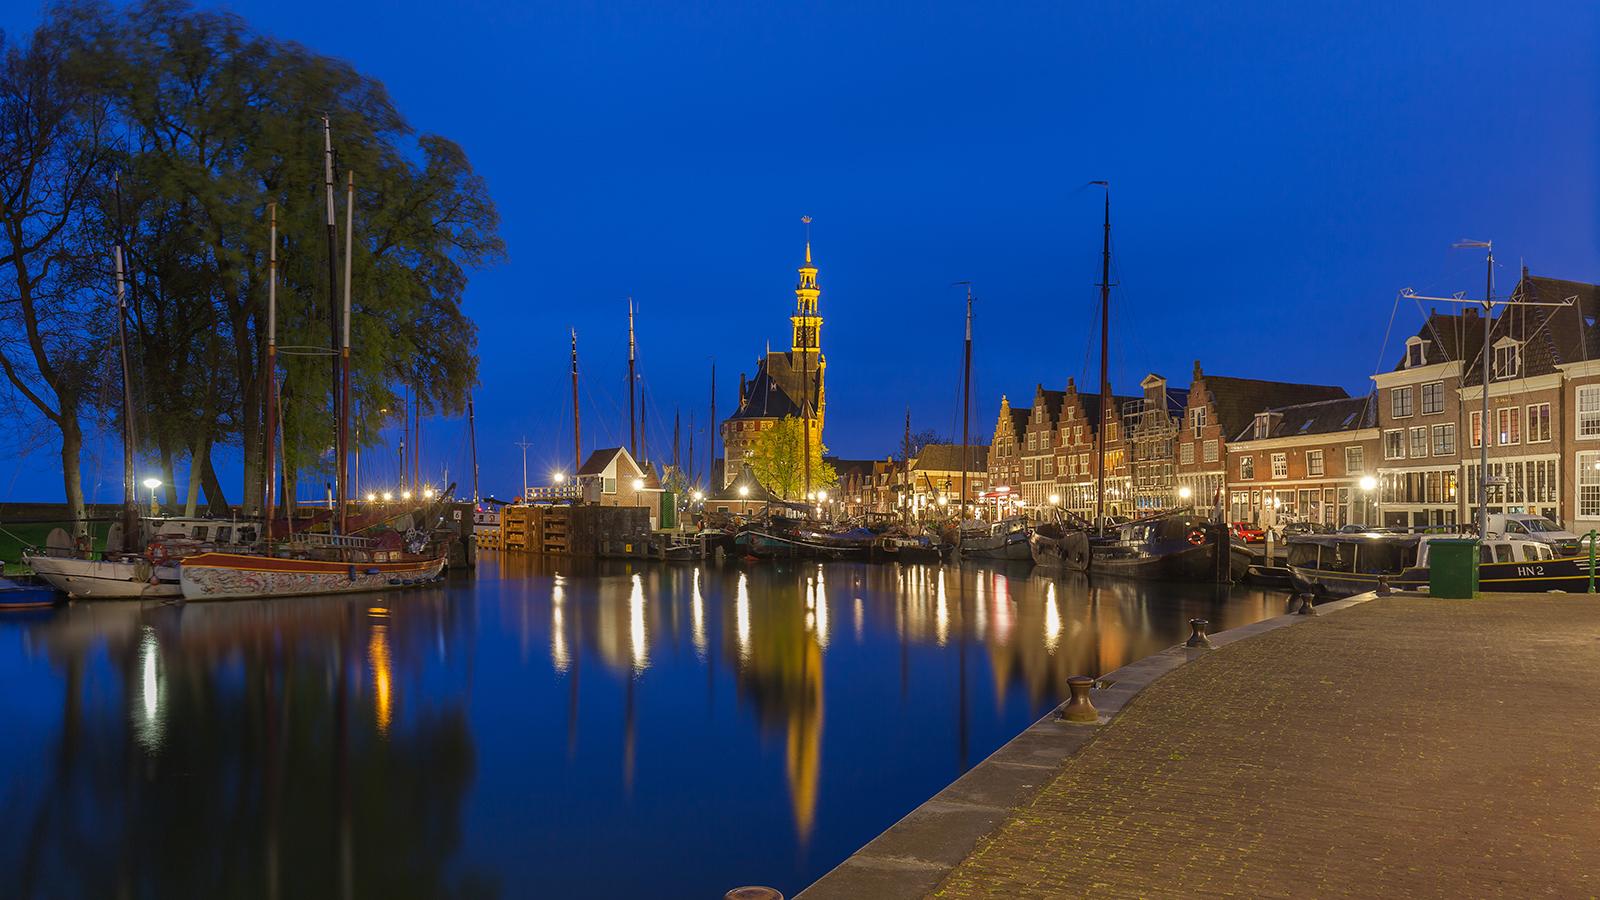 Binnenhaven Hoorn bij avondlicht